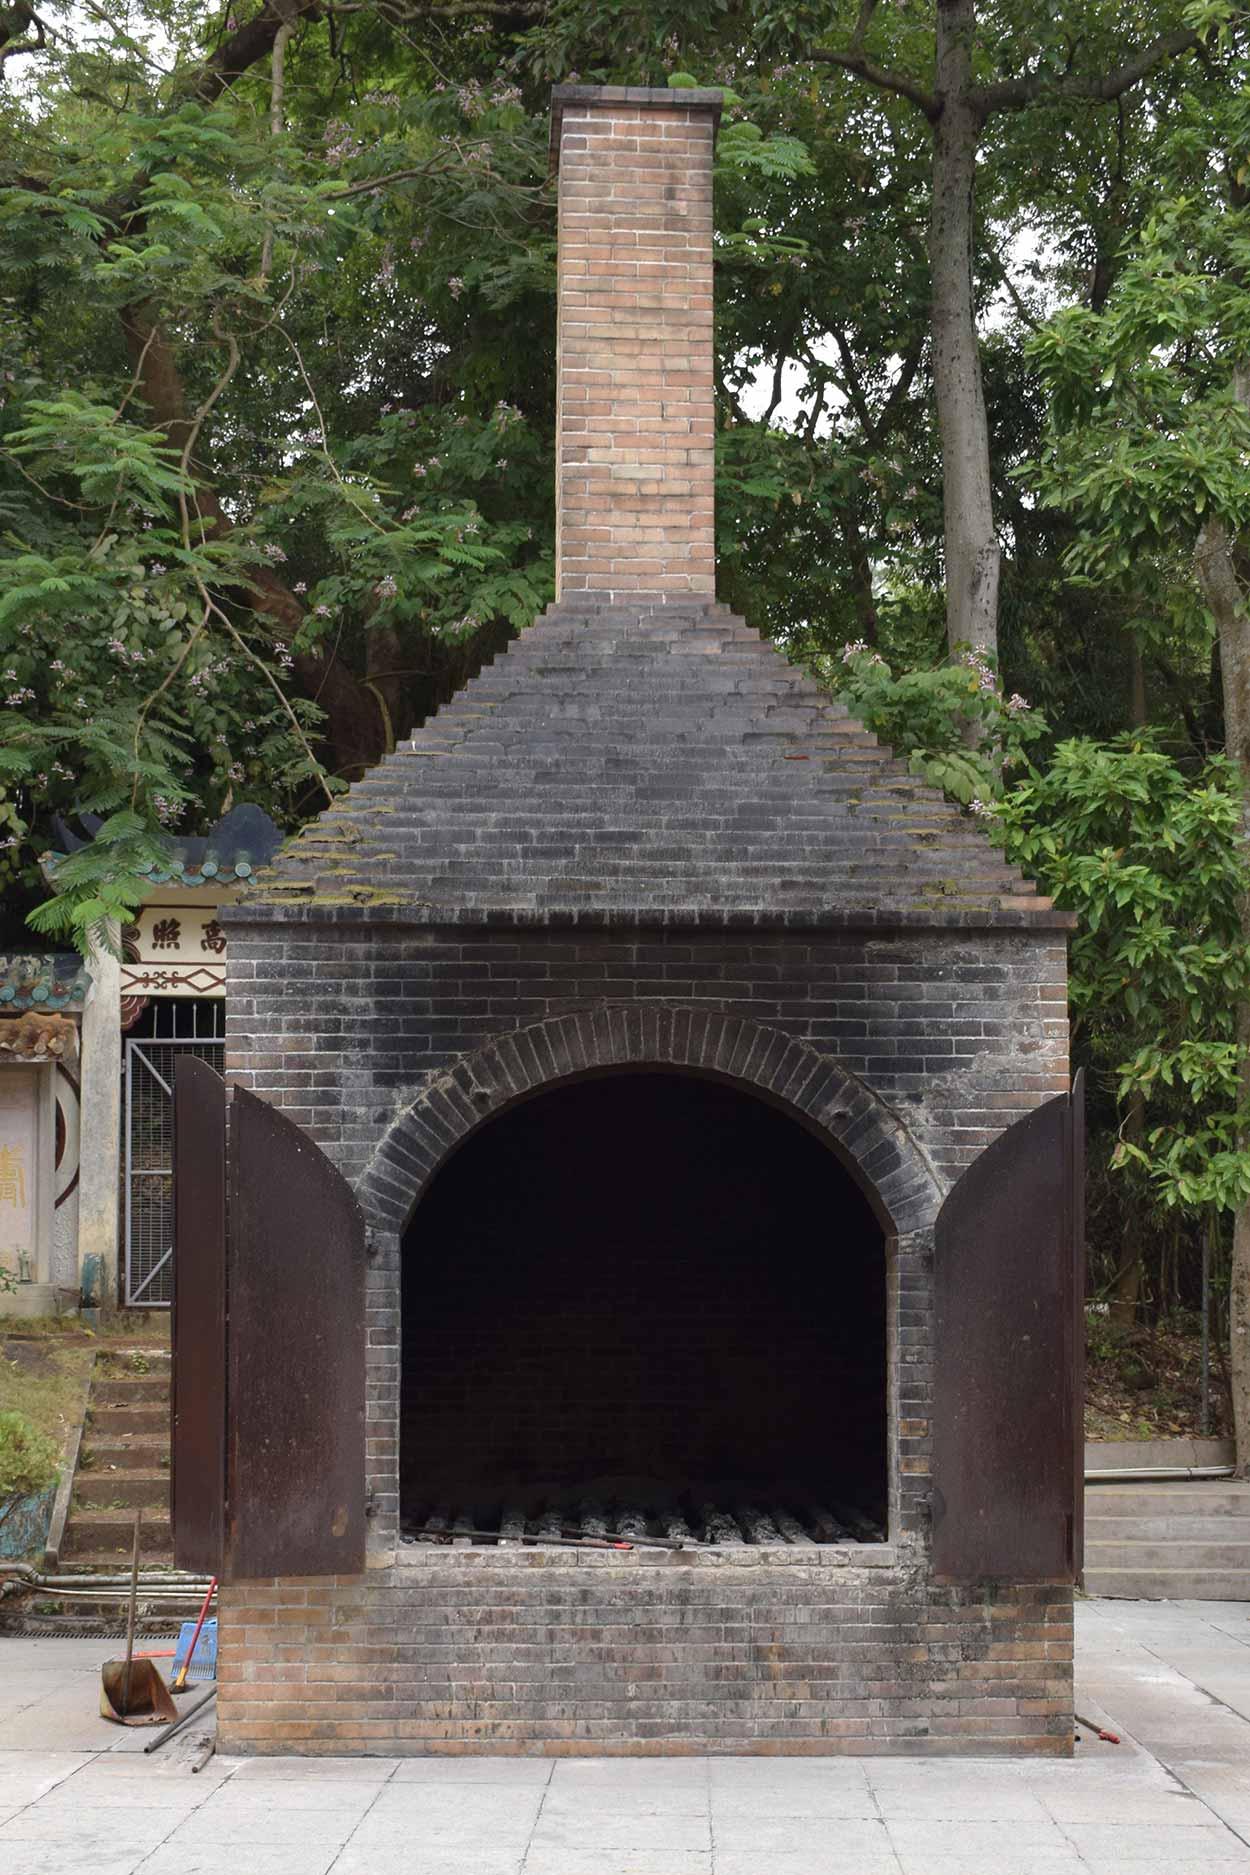 Crematorium, Fung Ying Seen Koon, Fanlingl, Hong Kong, China